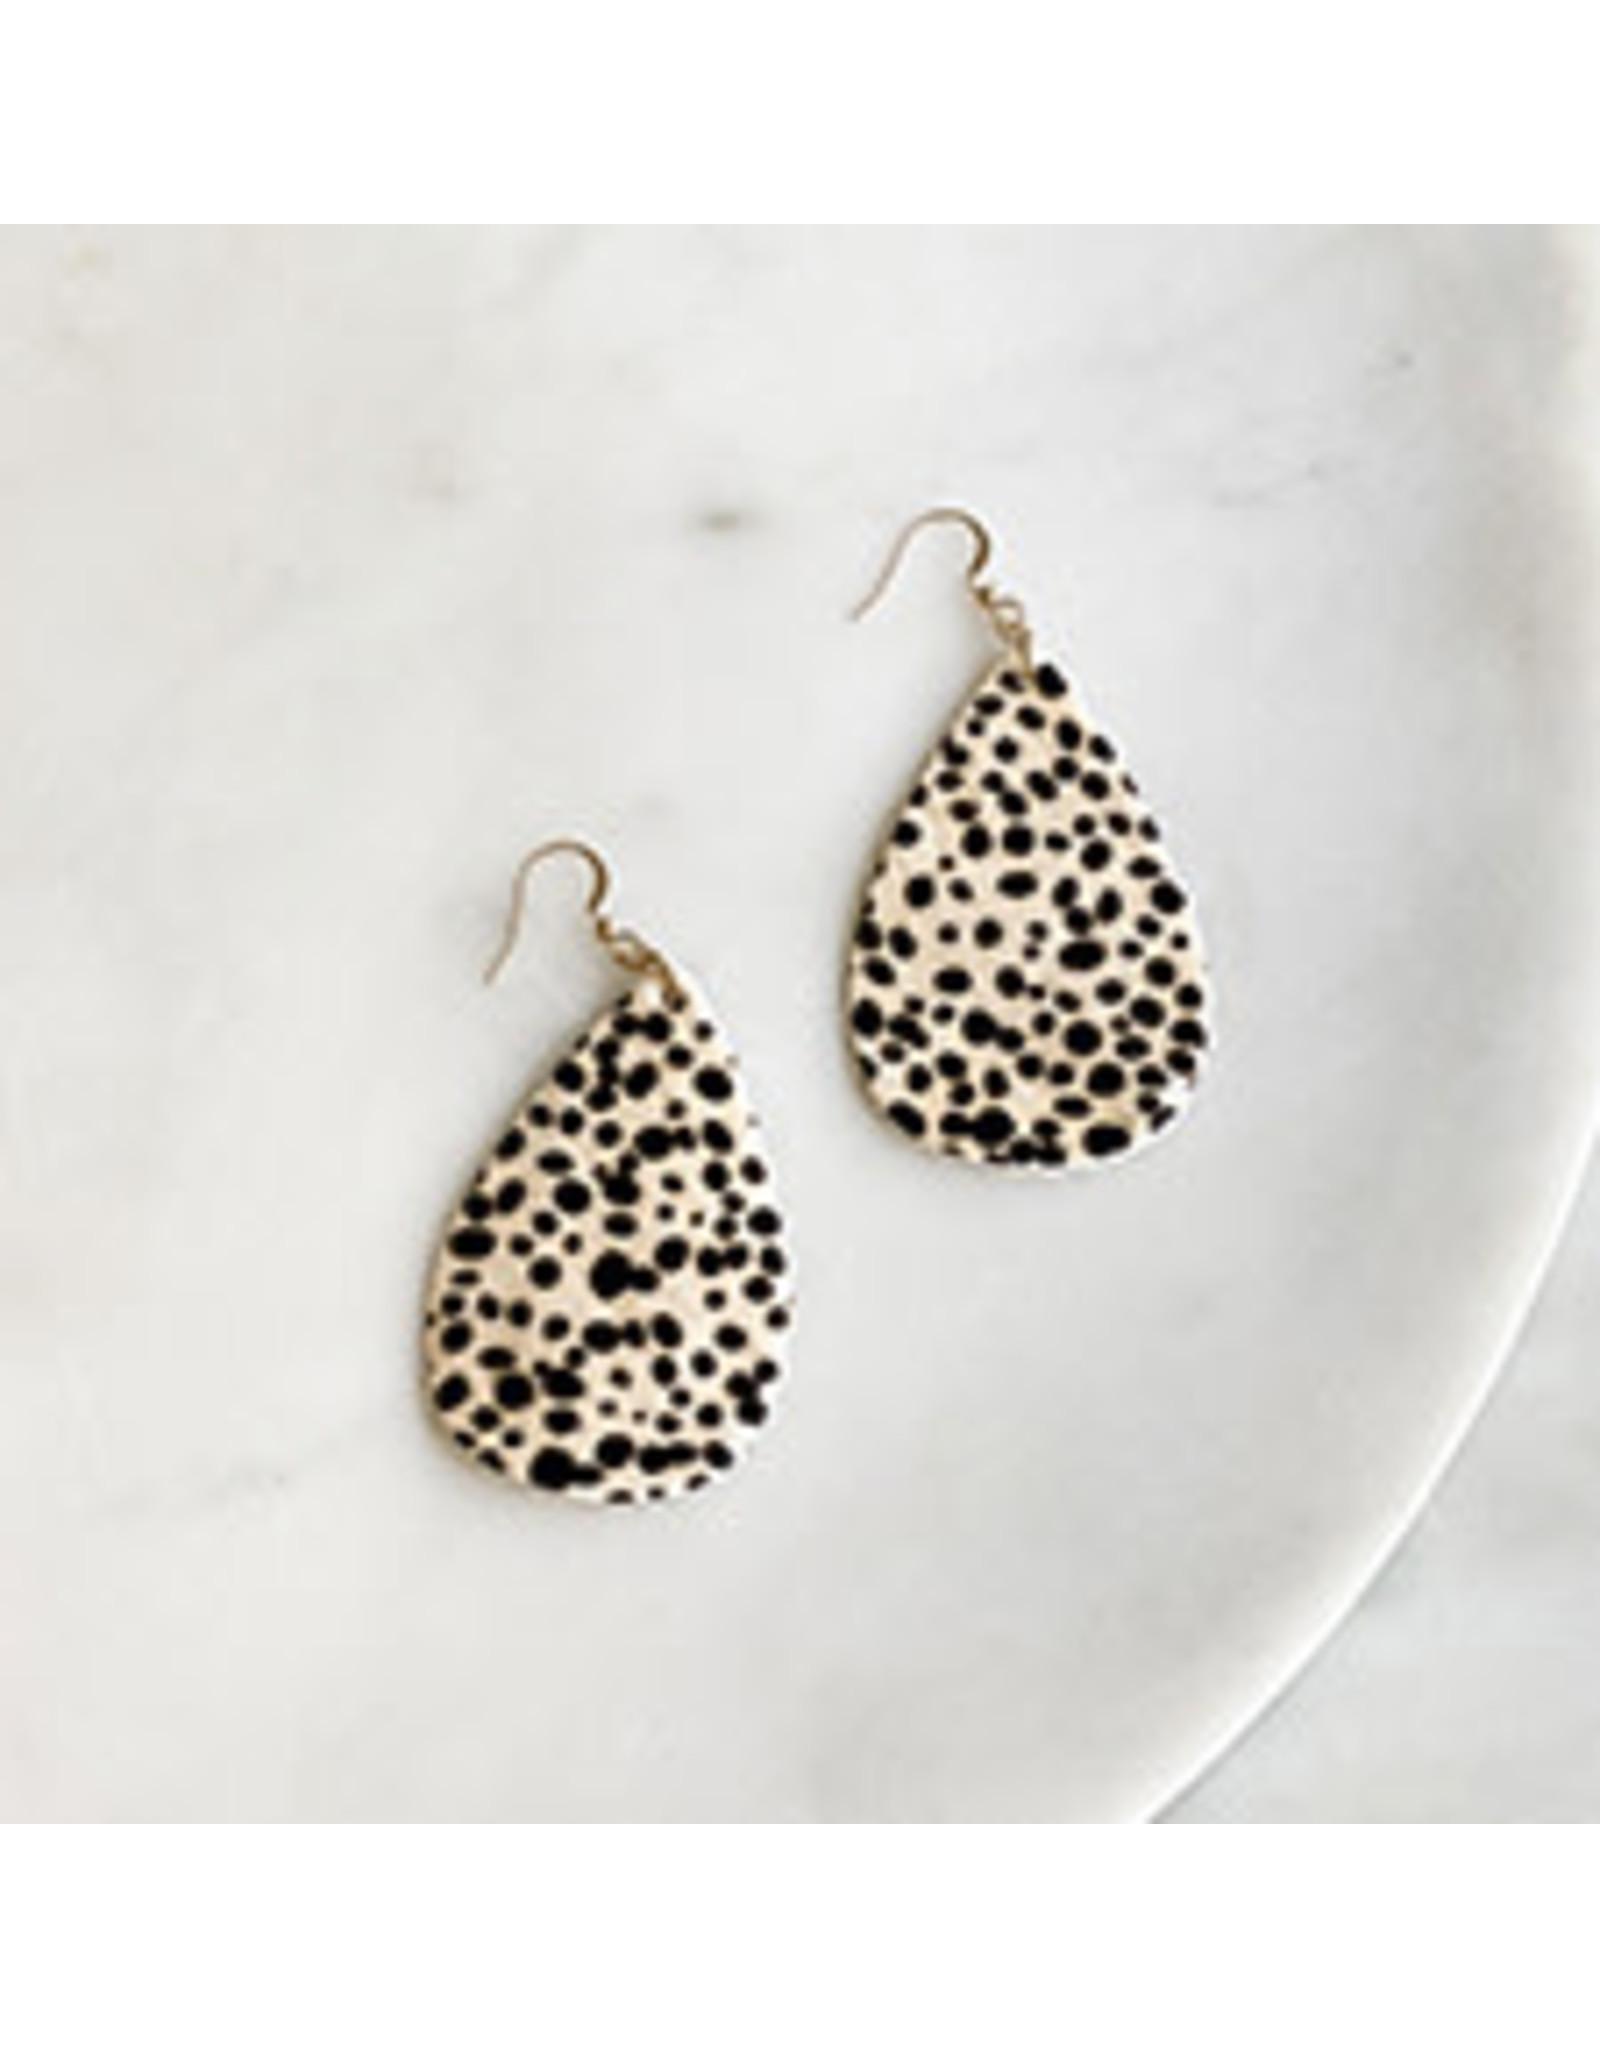 The Royal Standard Sawyer Cheetah Hide Earrings